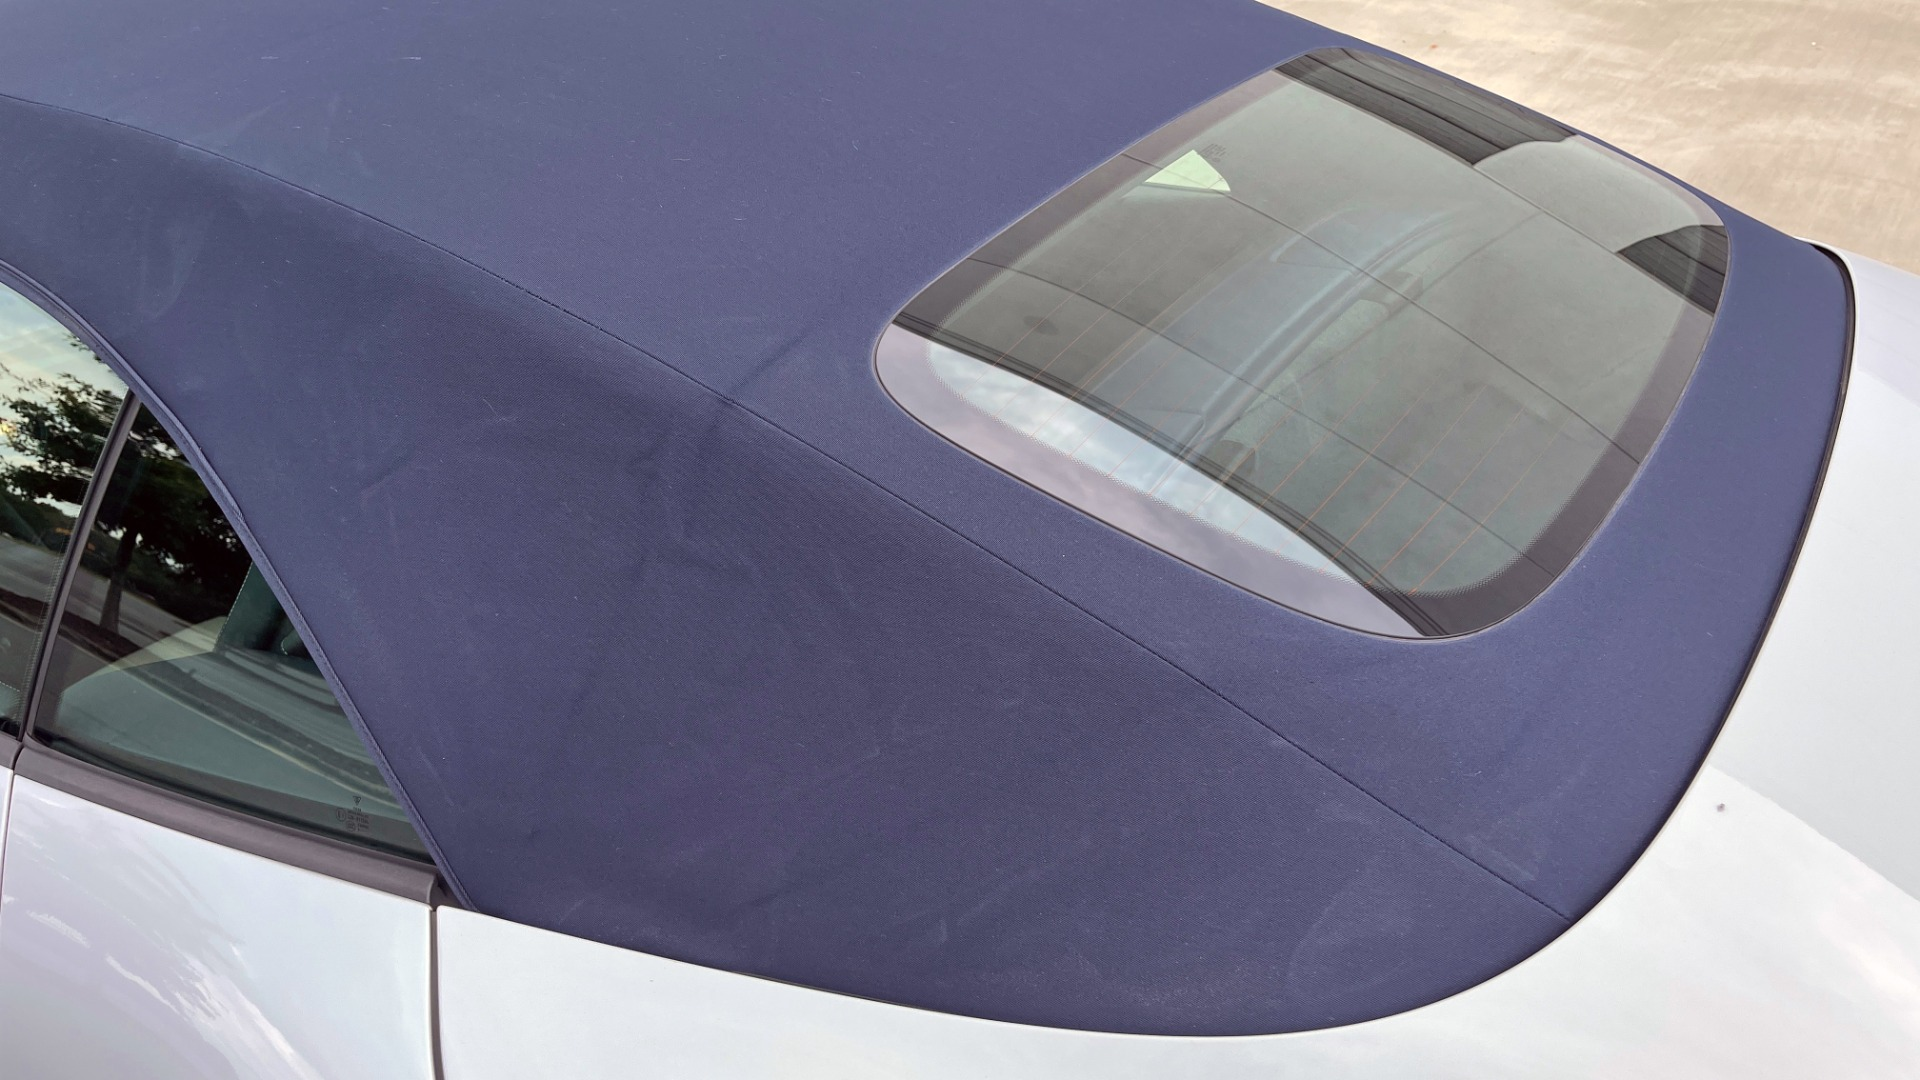 Used 2020 Porsche 911 CARRERA 4S CABRIOLET PREMIUM SPORT PKG / NAV / BOSE / LIGHT DESIGN PKG for sale $167,595 at Formula Imports in Charlotte NC 28227 12